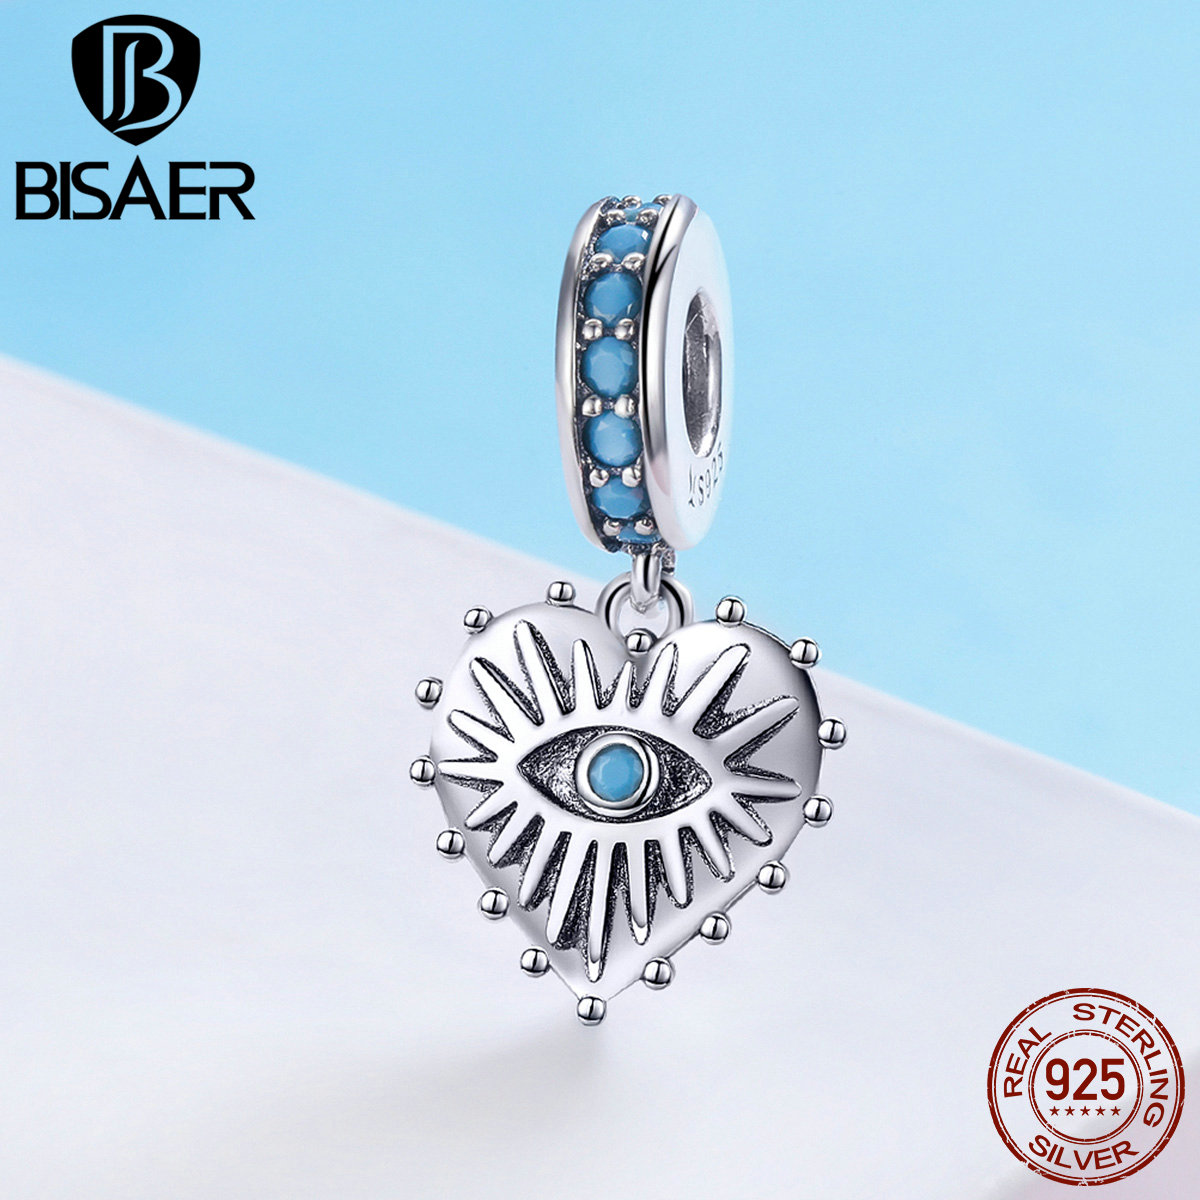 BISAER 925 Sterling Silver Bohemian Styles Blue Eye Beads Vintage Lucky Charm Fit Original Bracelets DIY Jewelry Making ECC873